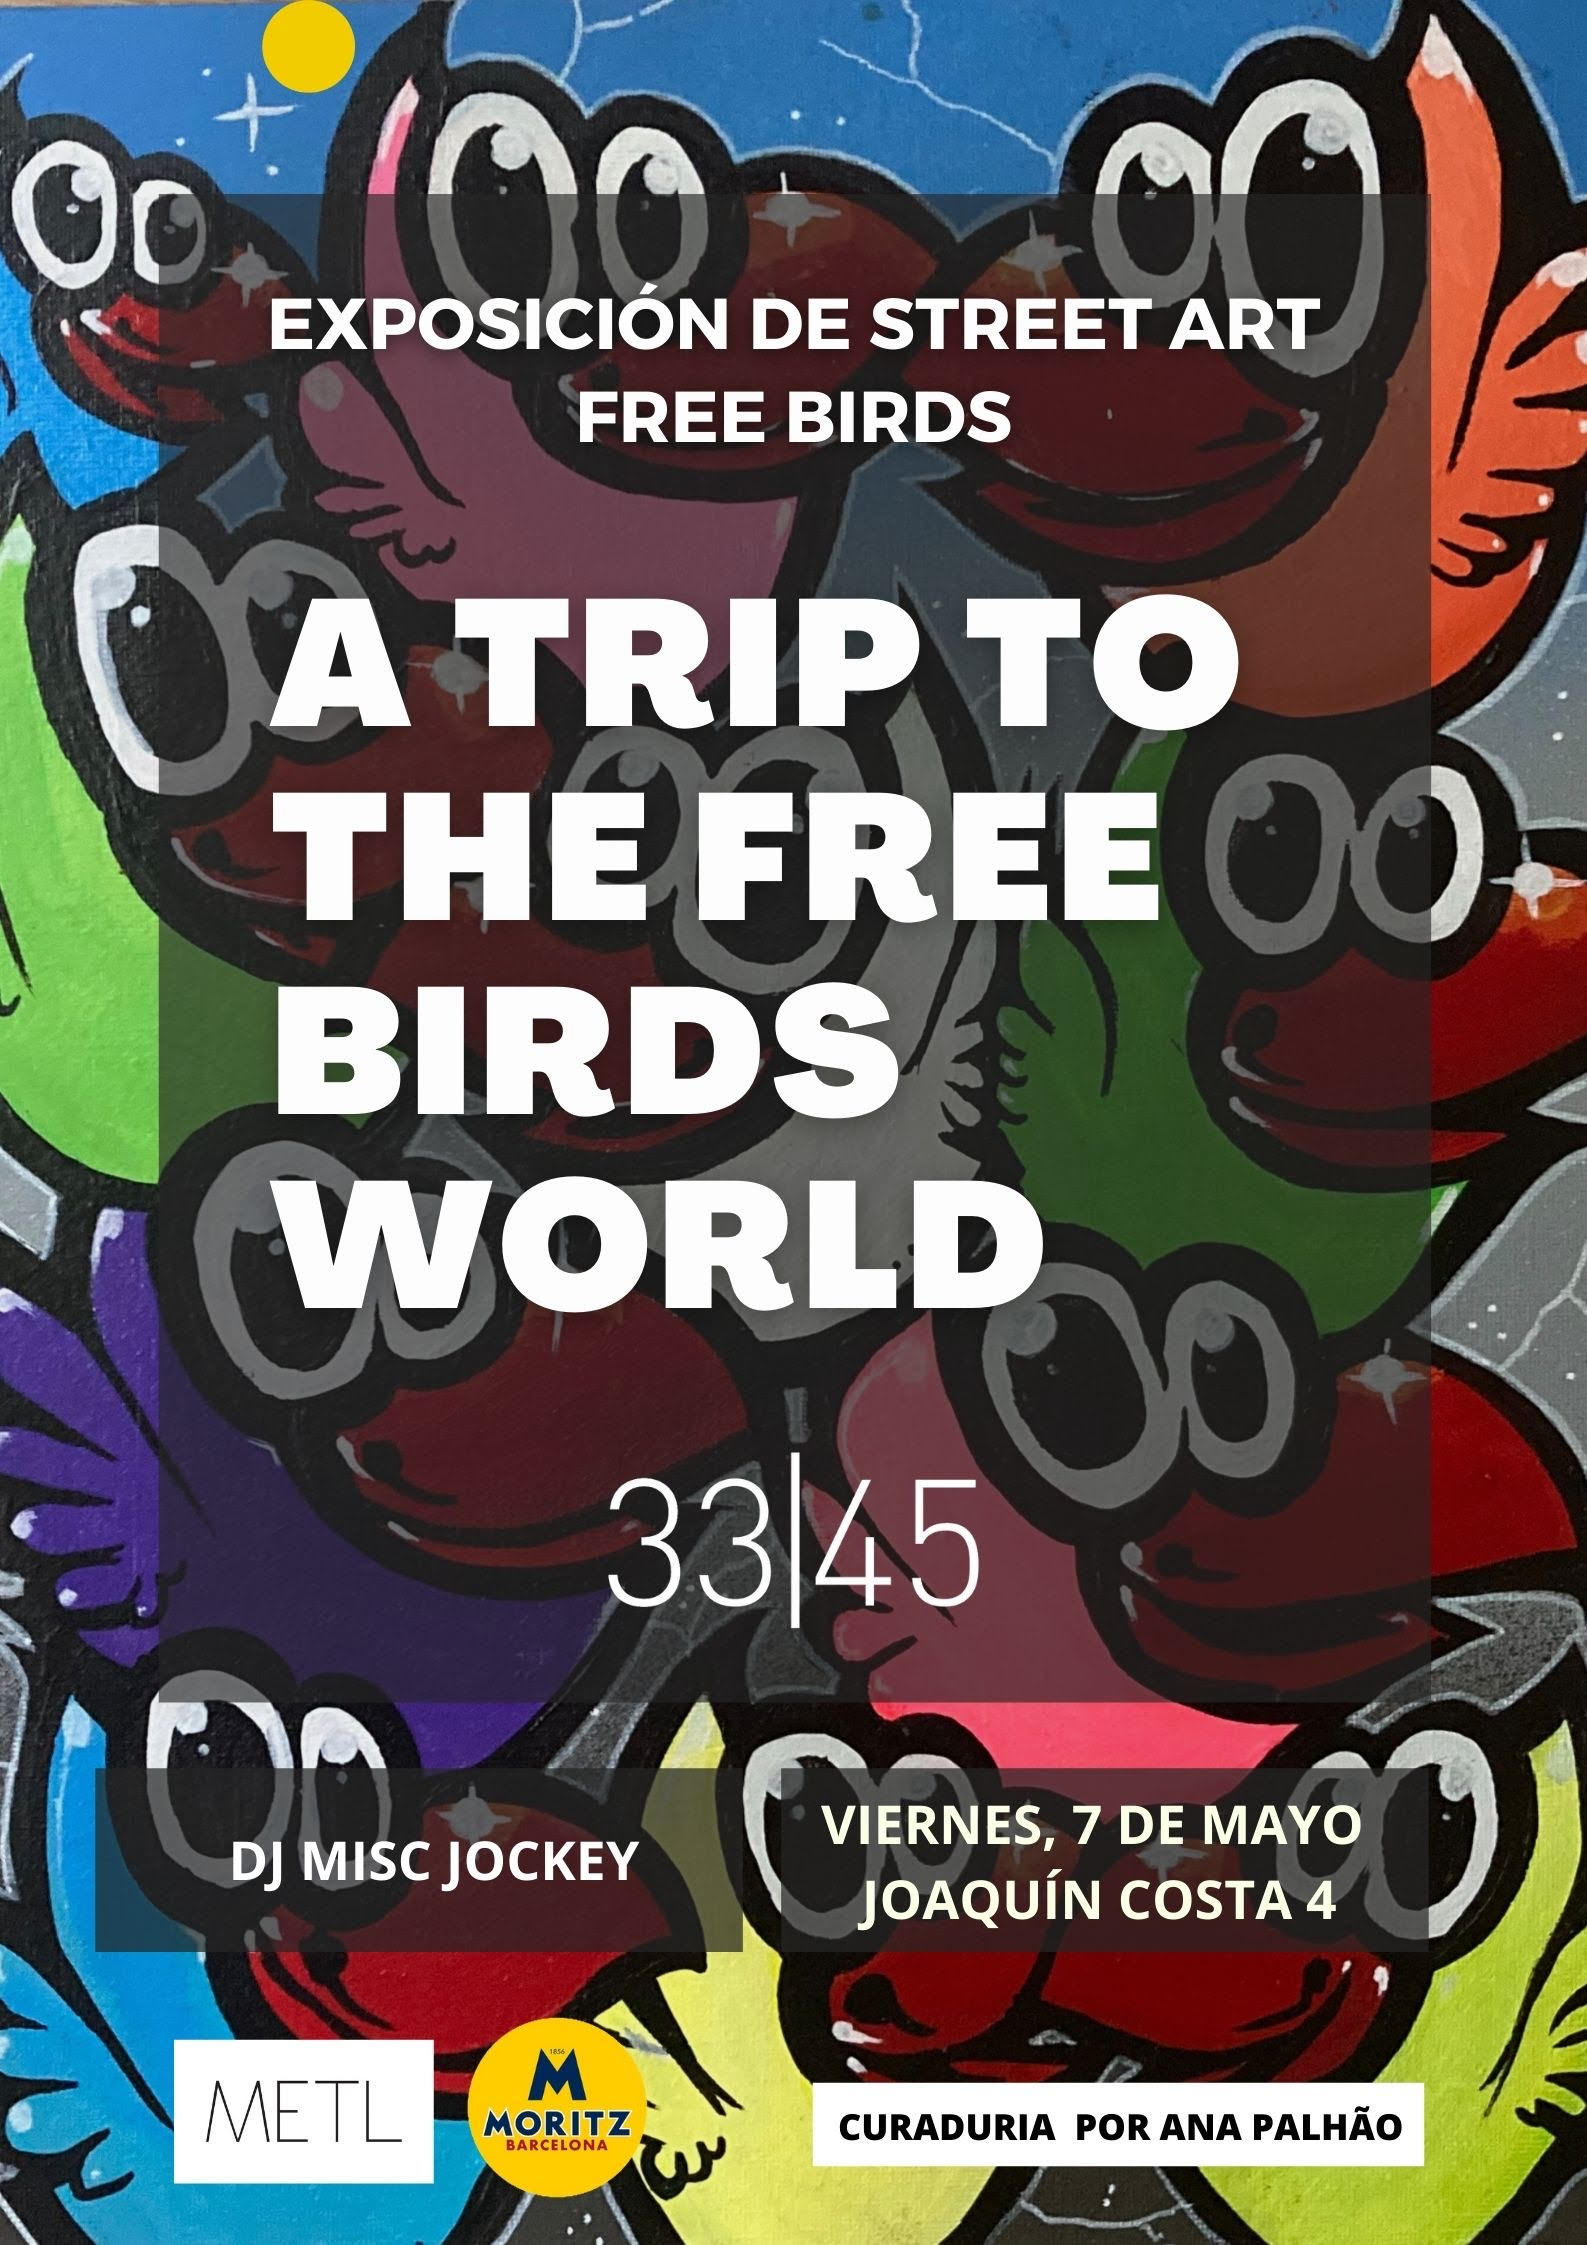 arte urbano exposición de arte Freebirds barcelona